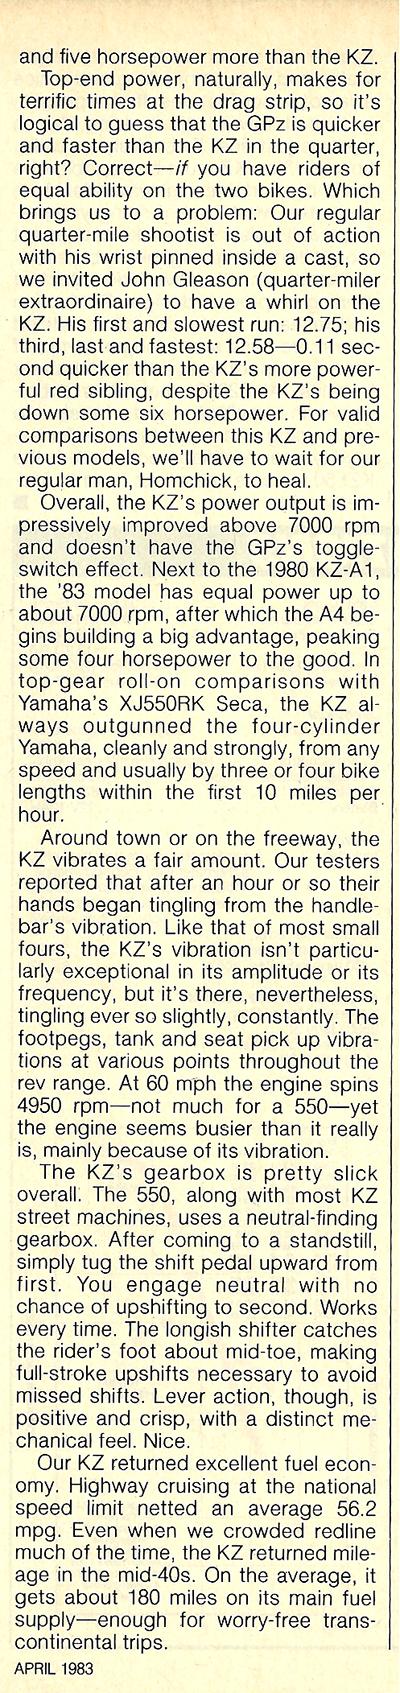 1983 Kawasaki KZ550 A4 road test 7.jpg